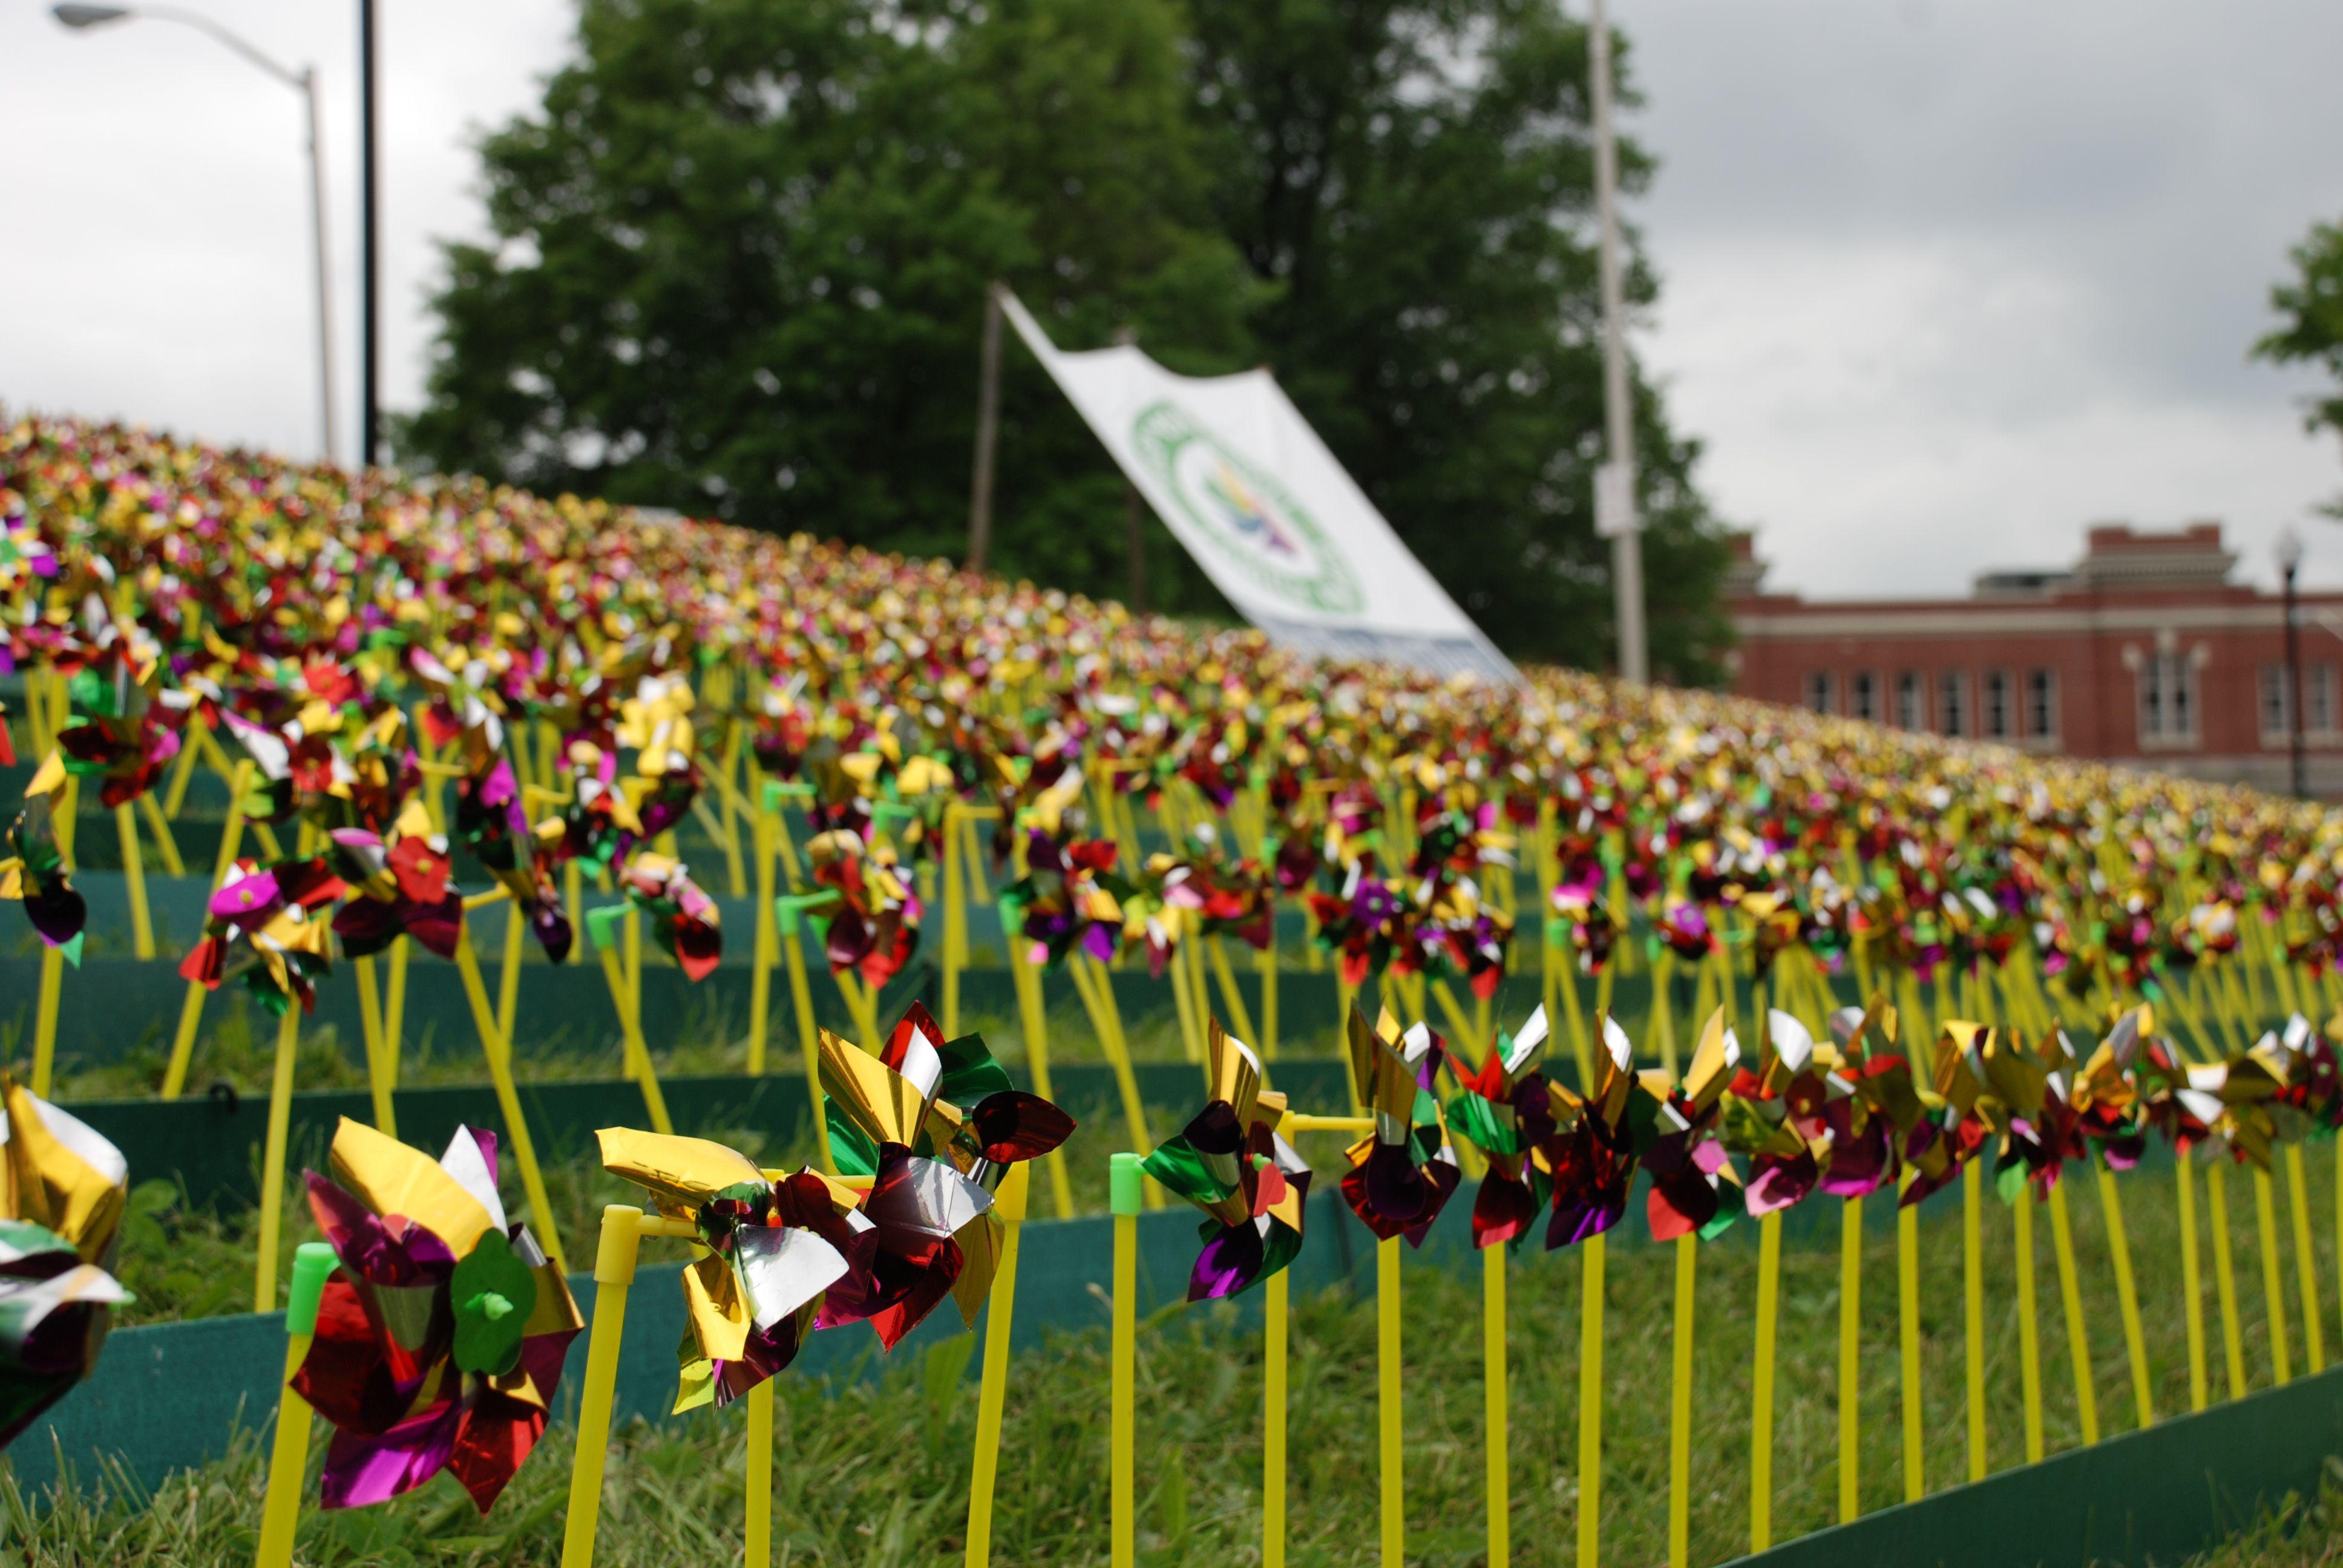 17 Best 1000 images about Pinwheels on Pinterest Gardens Pinwheels